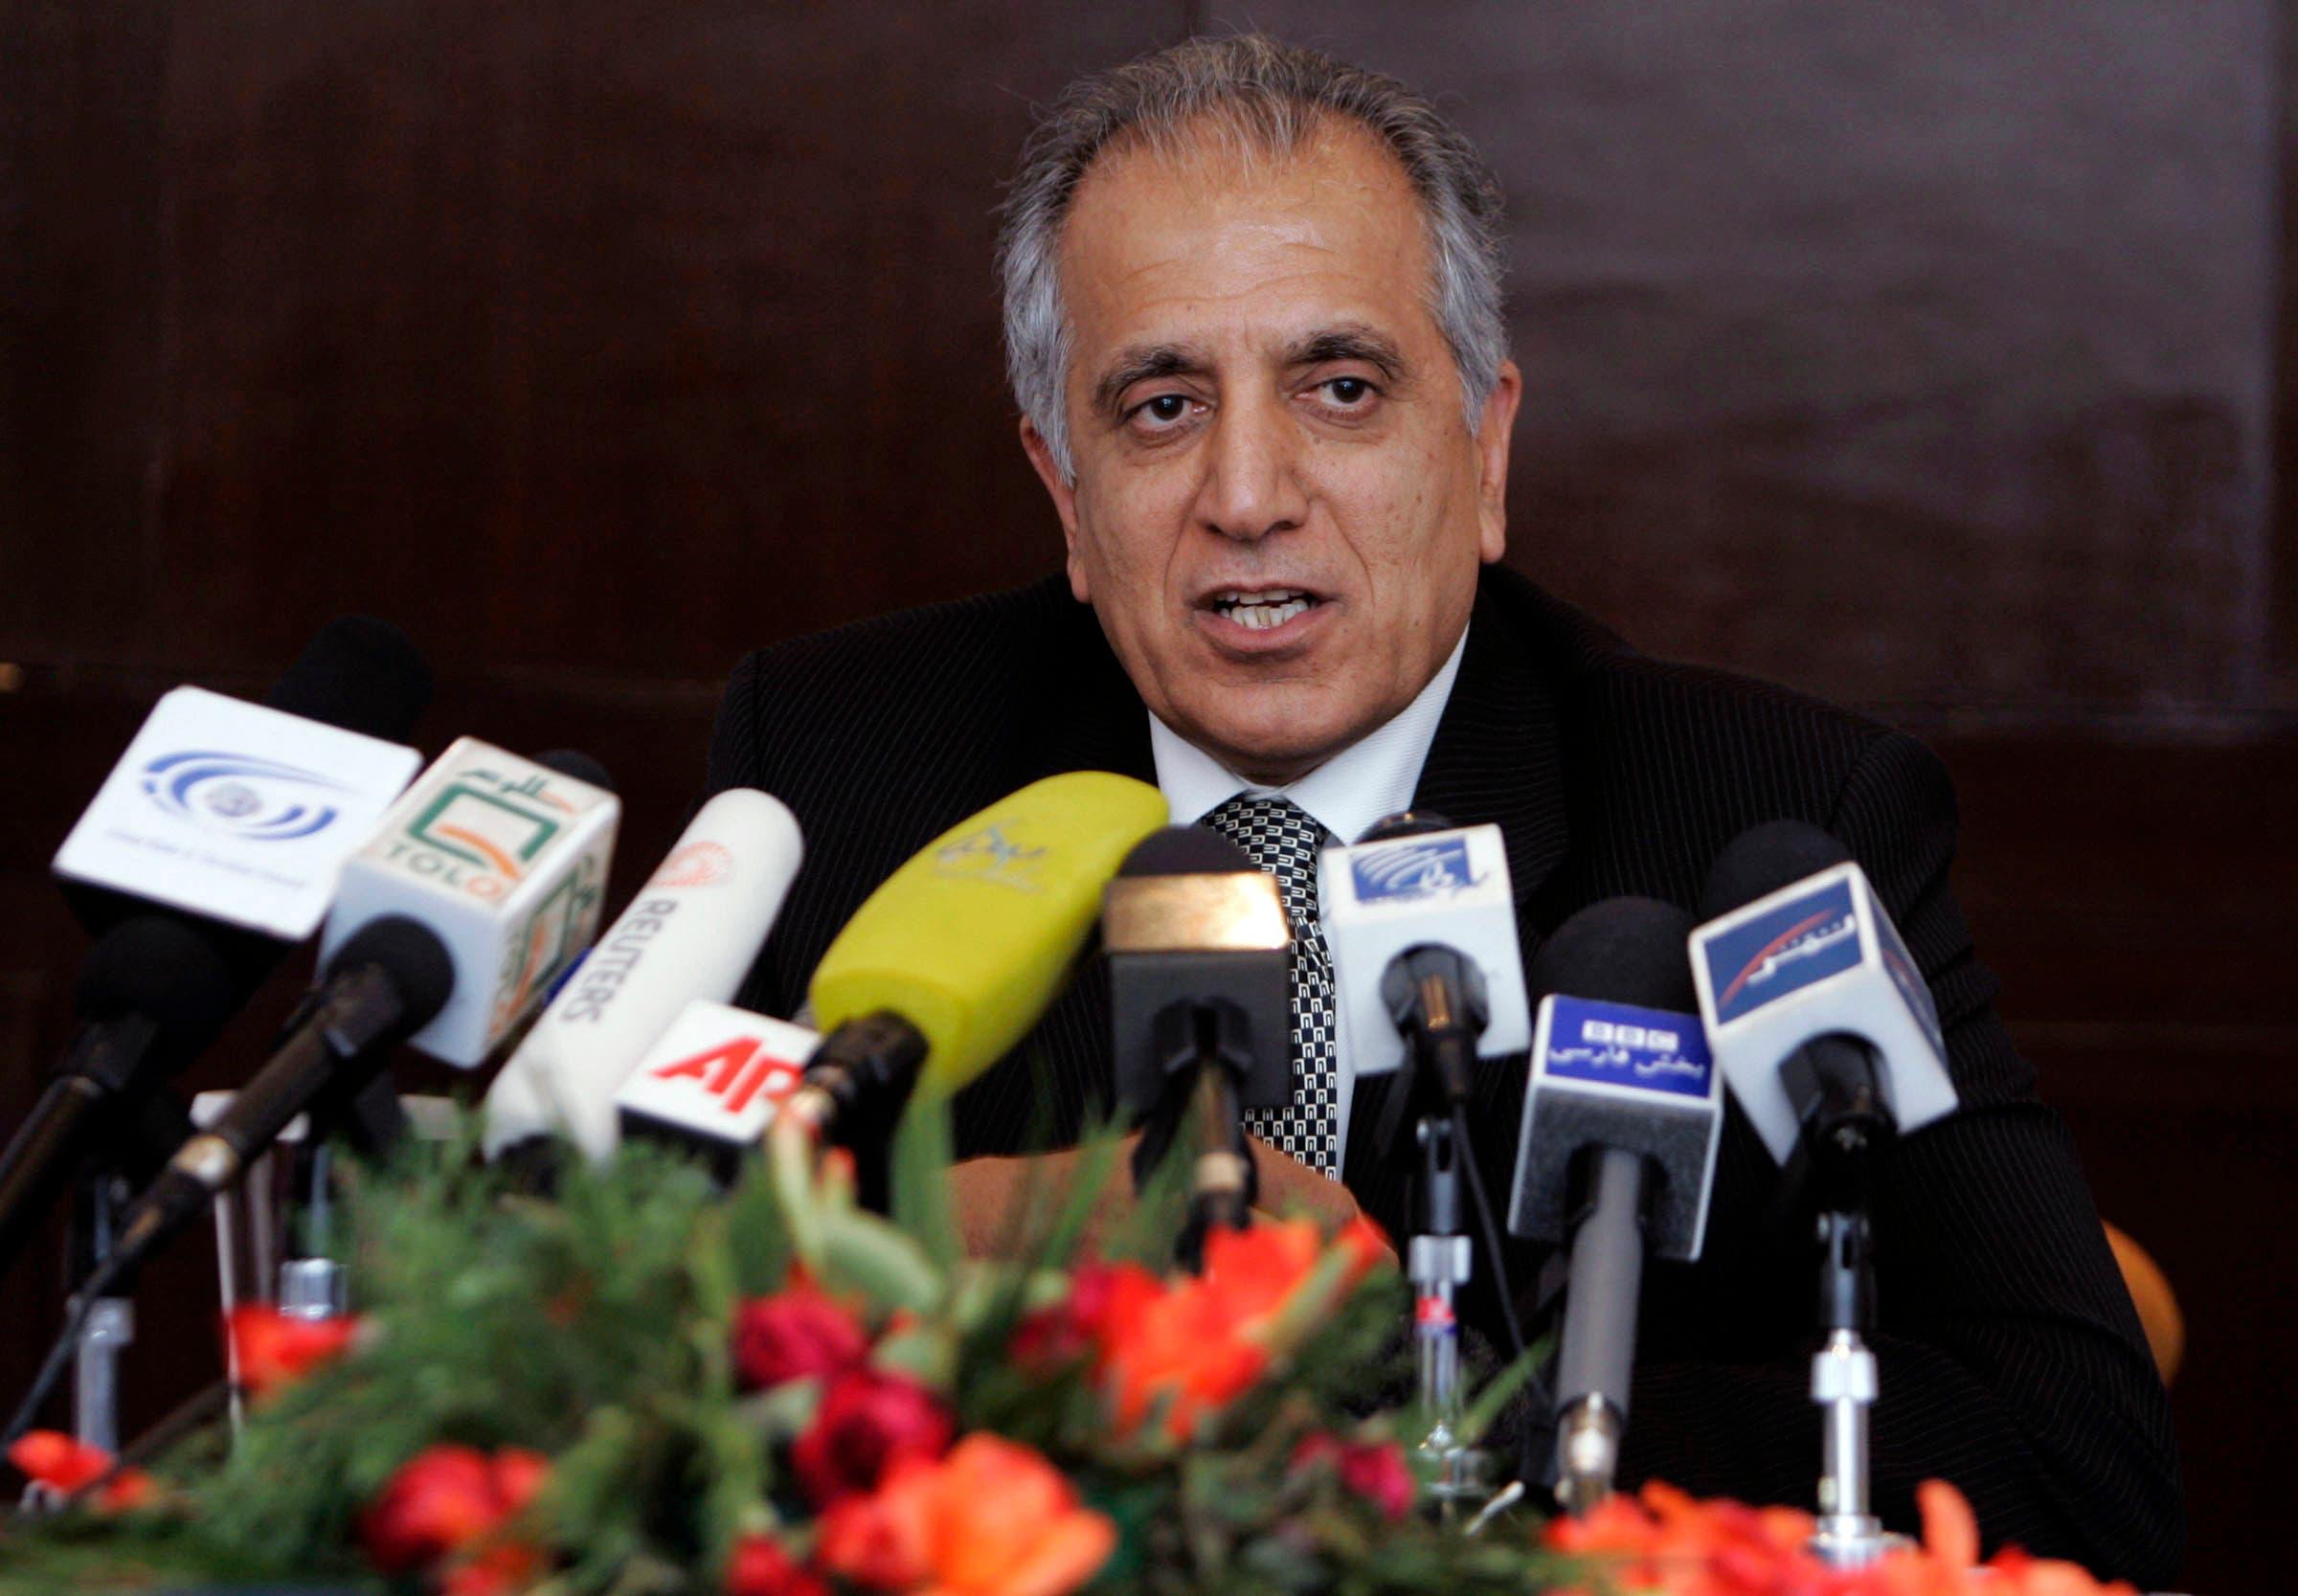 Zalmay Khalilzad in Kabul on March 13, 2009. (AP)